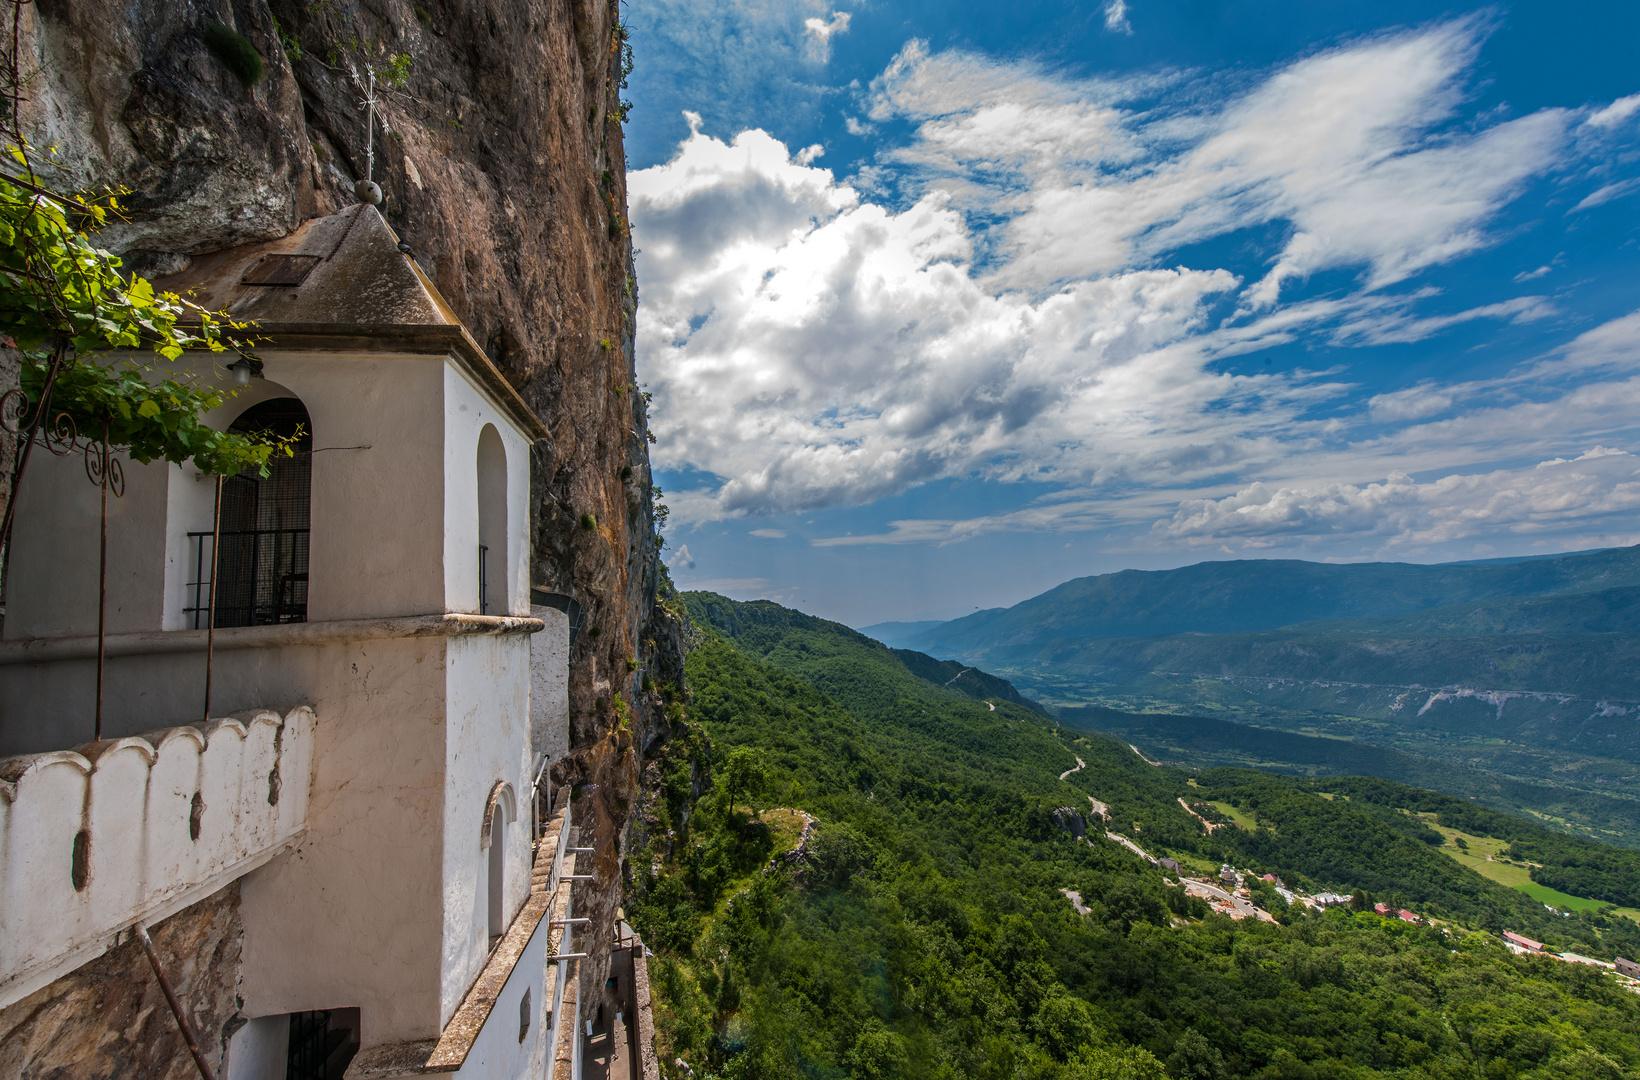 Auf den Spuren des Hl. Vasilji - Kloster Ostrog